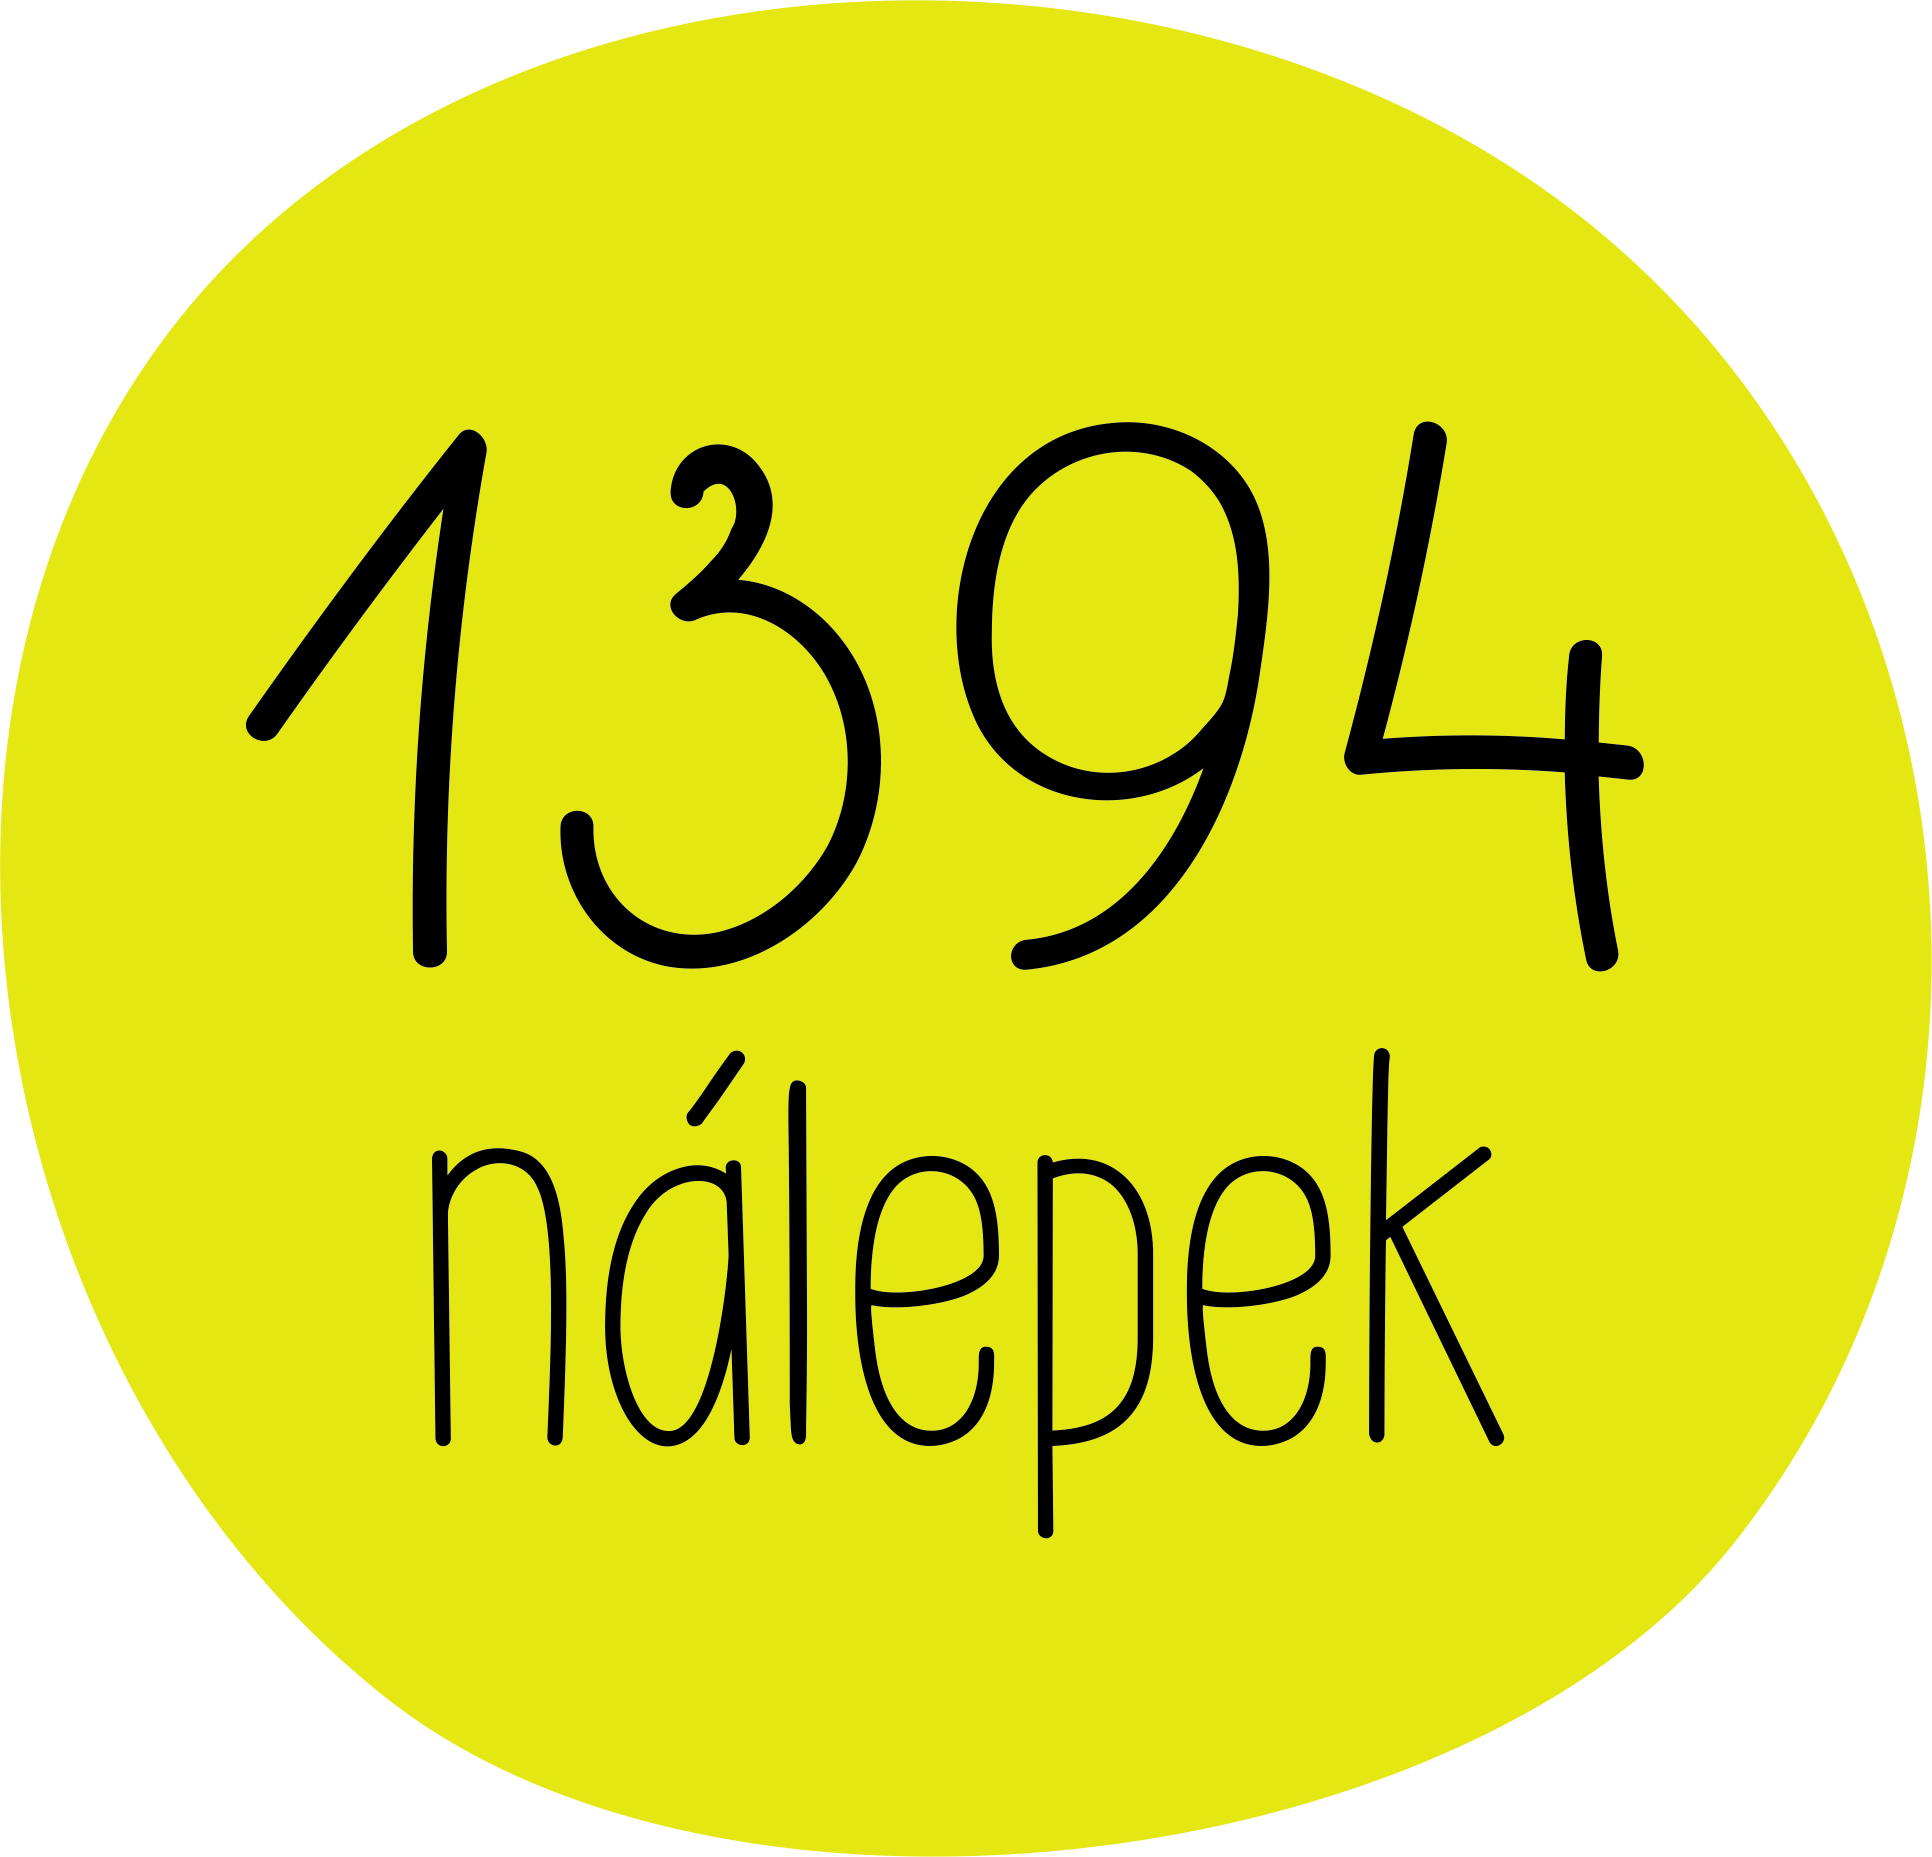 13942